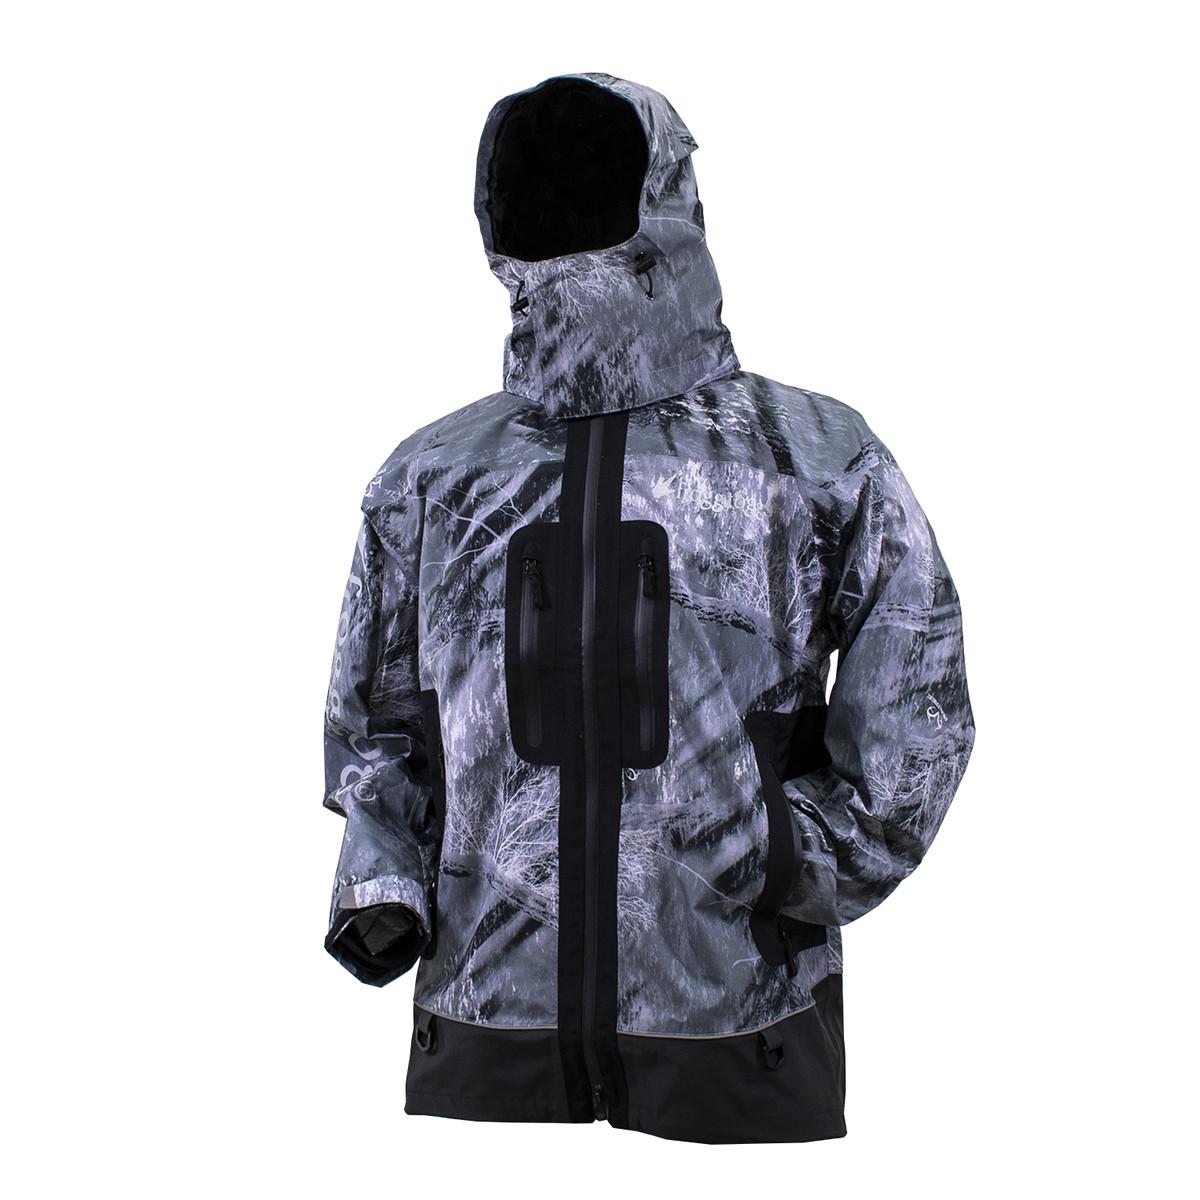 Limited Edition Pilot Pro Jacket | REALTREE FISHING GRAY